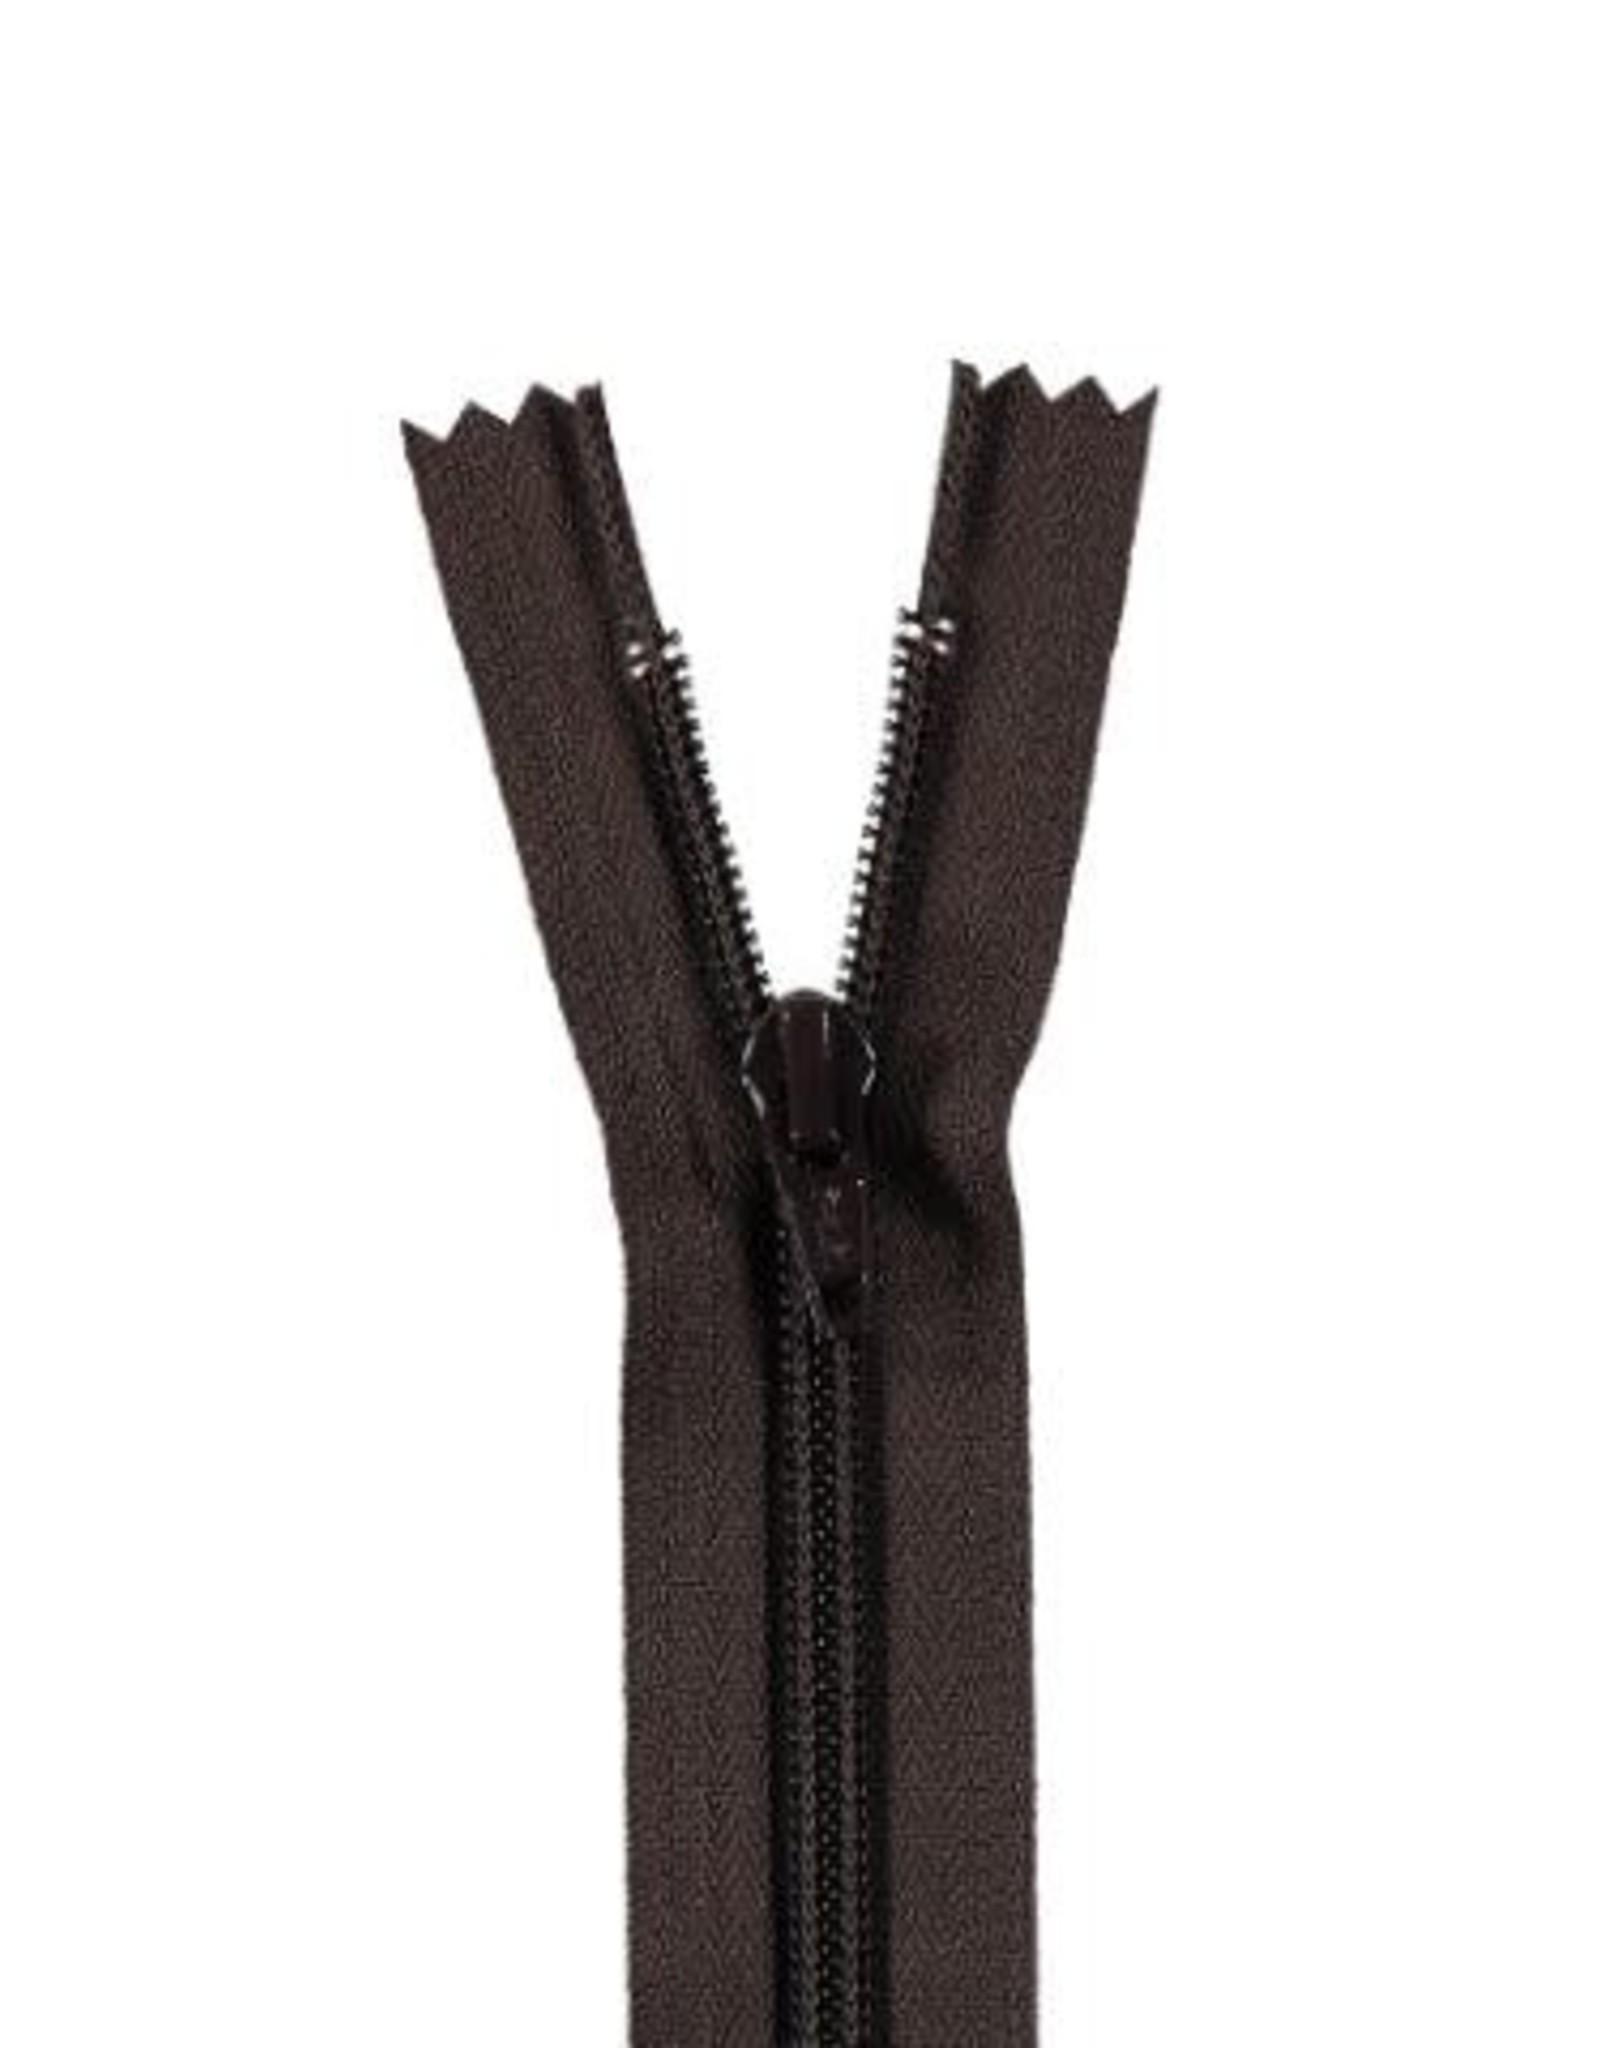 YKK Spiraalrits niet-DB 3mm donker bruin 570-50cm